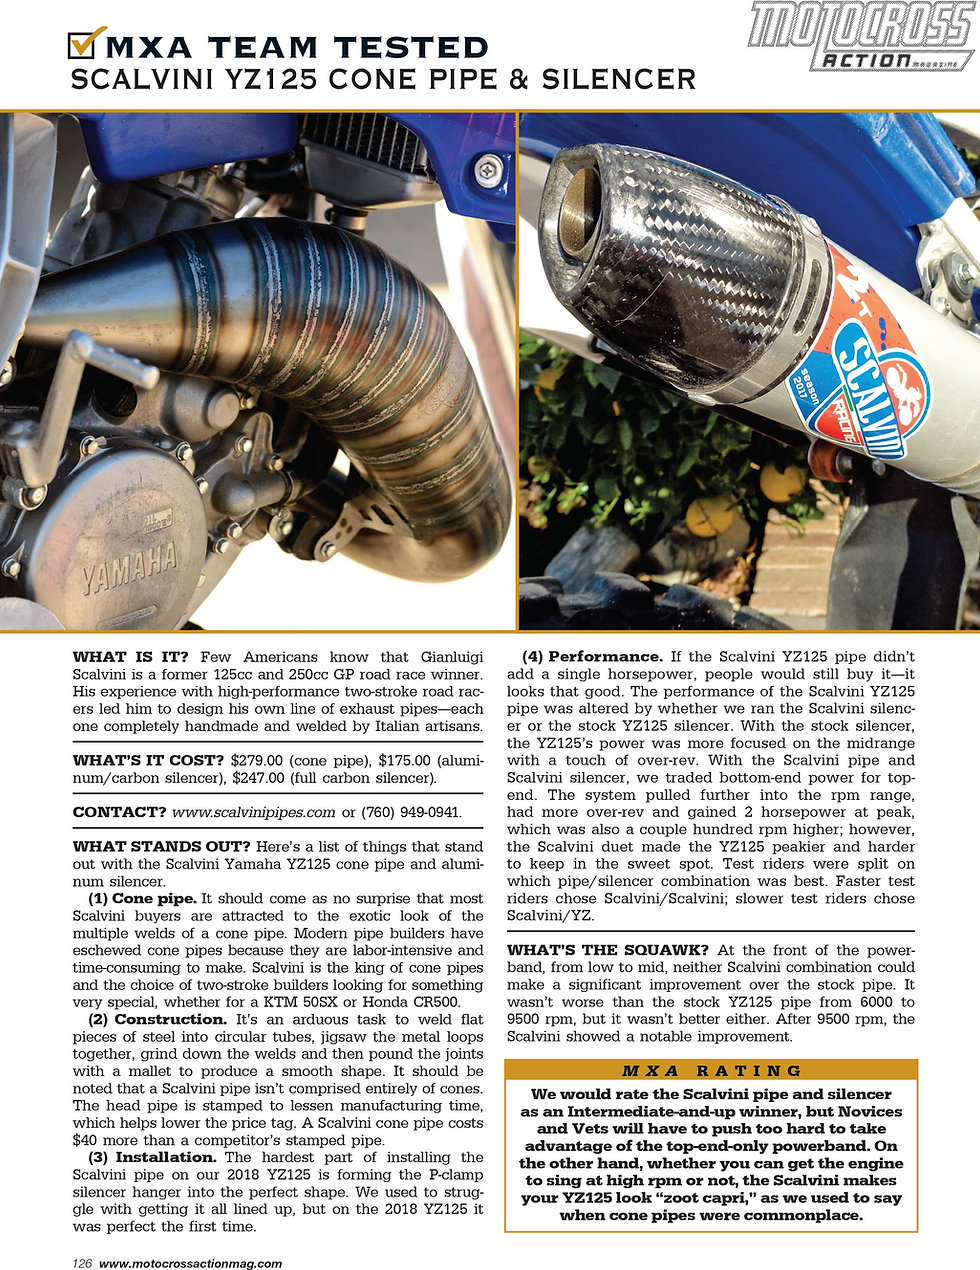 Scalvini 2017 KTM-Husky Cone Pipe MXA Mag Test May 2017